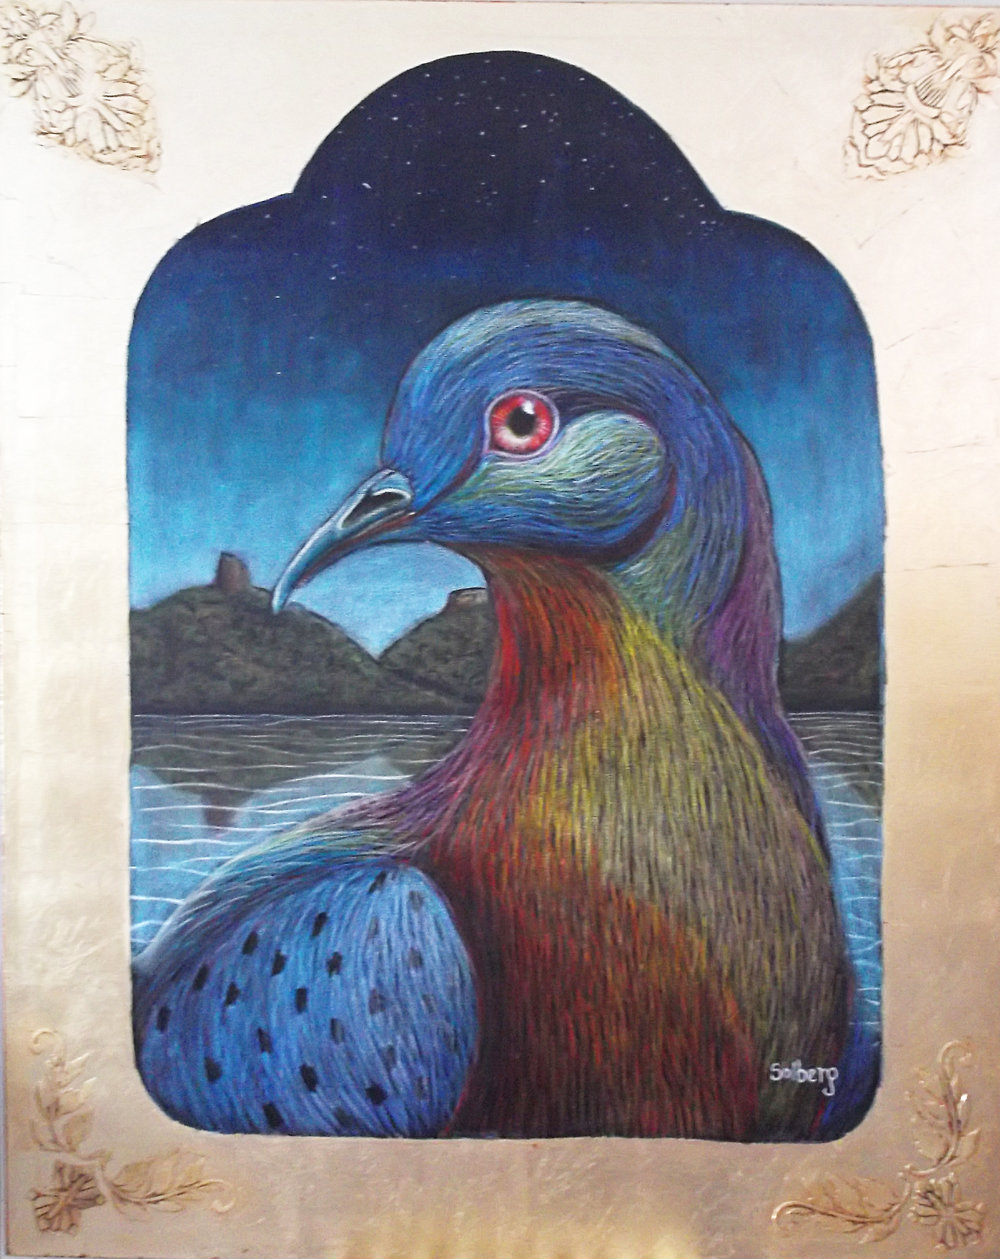 Martha; The Last Passenger Pigeon